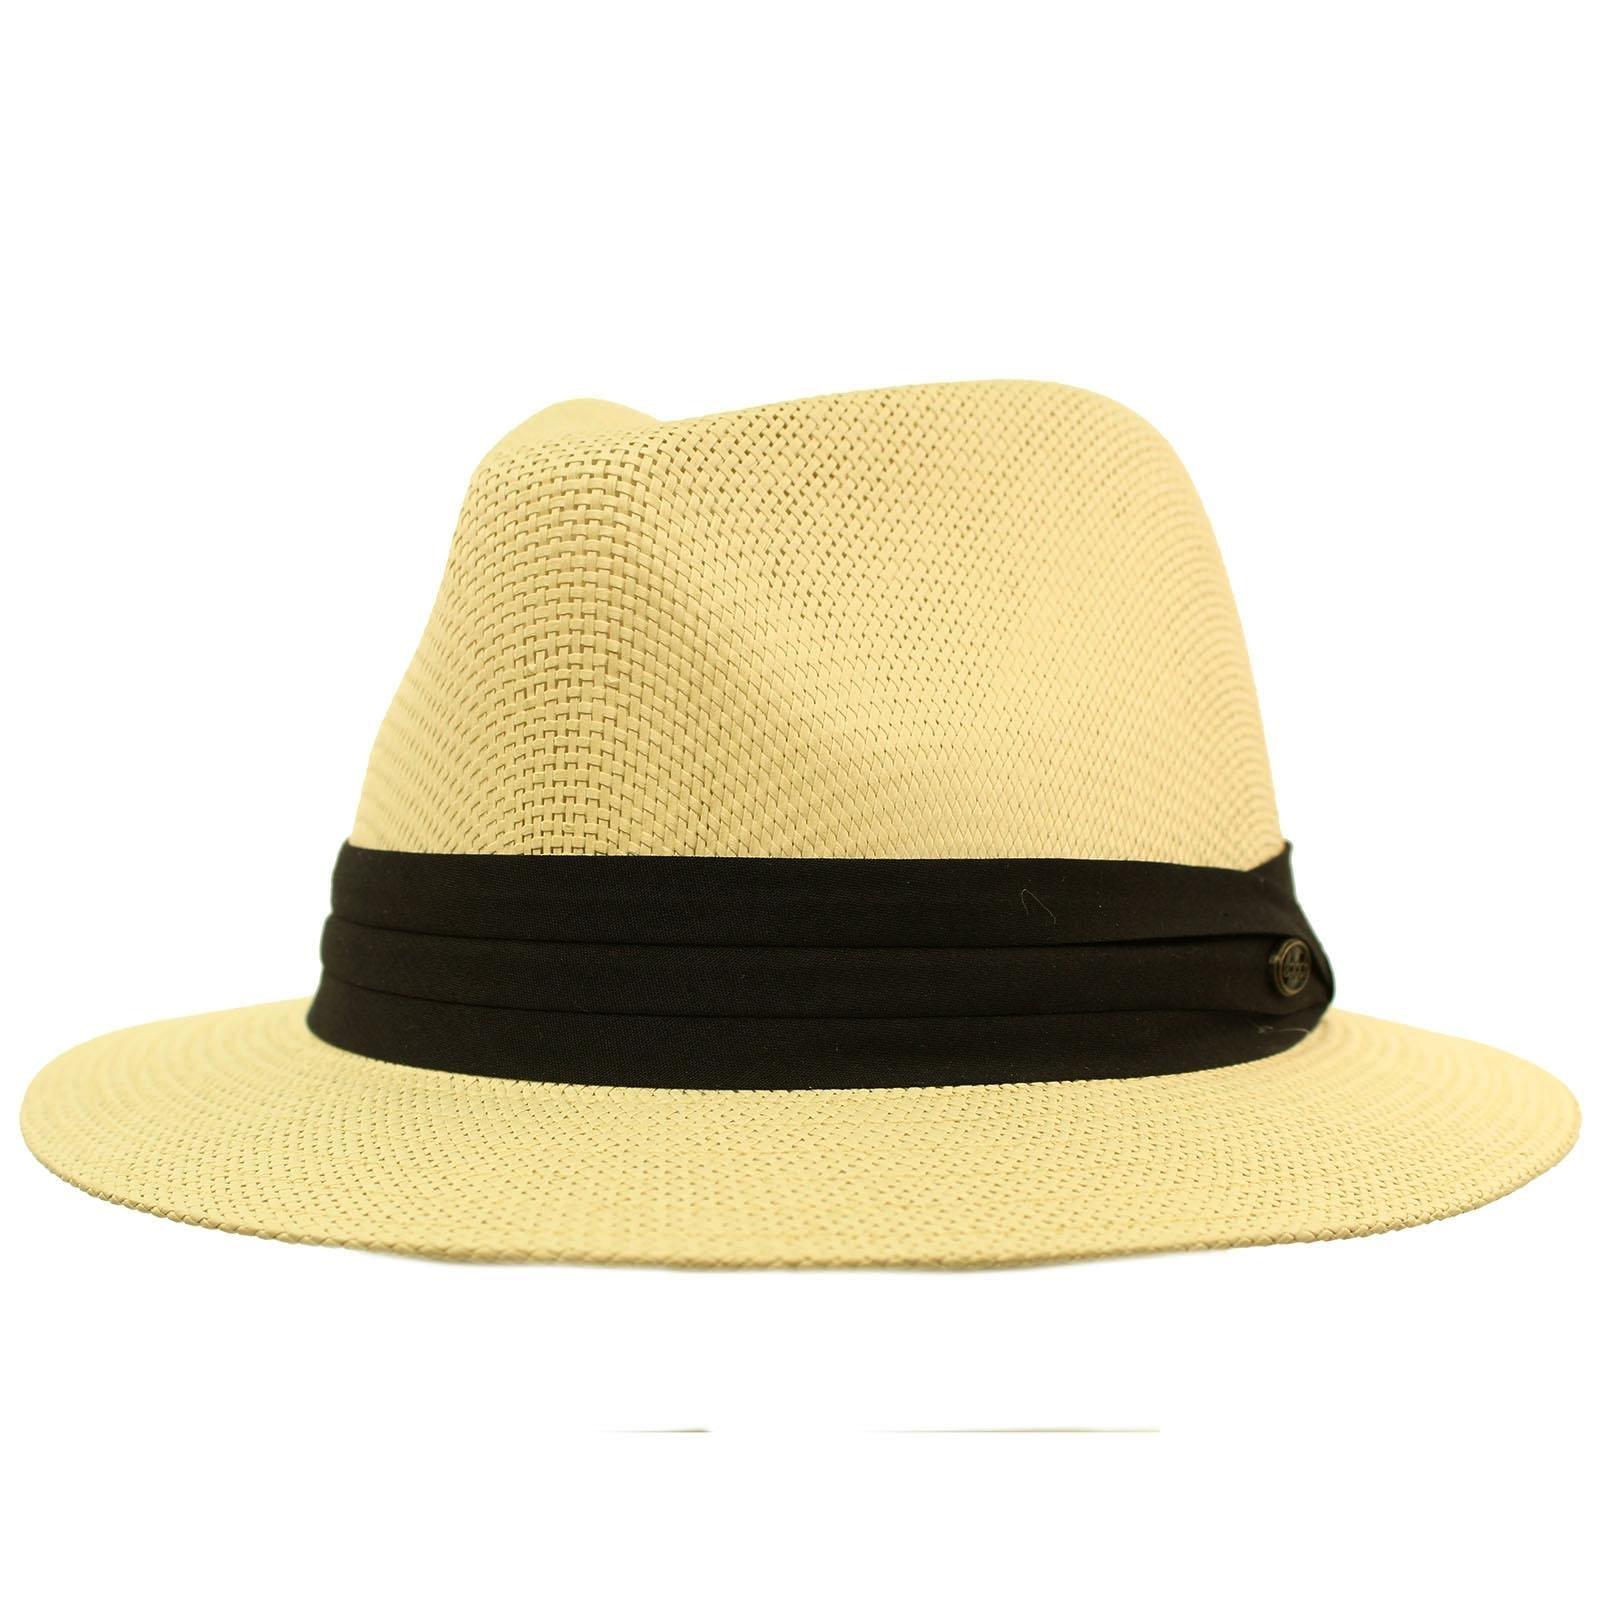 Men's Summer Lightweight Short Panama Derby Fedora Flat Brim Hat L/XL